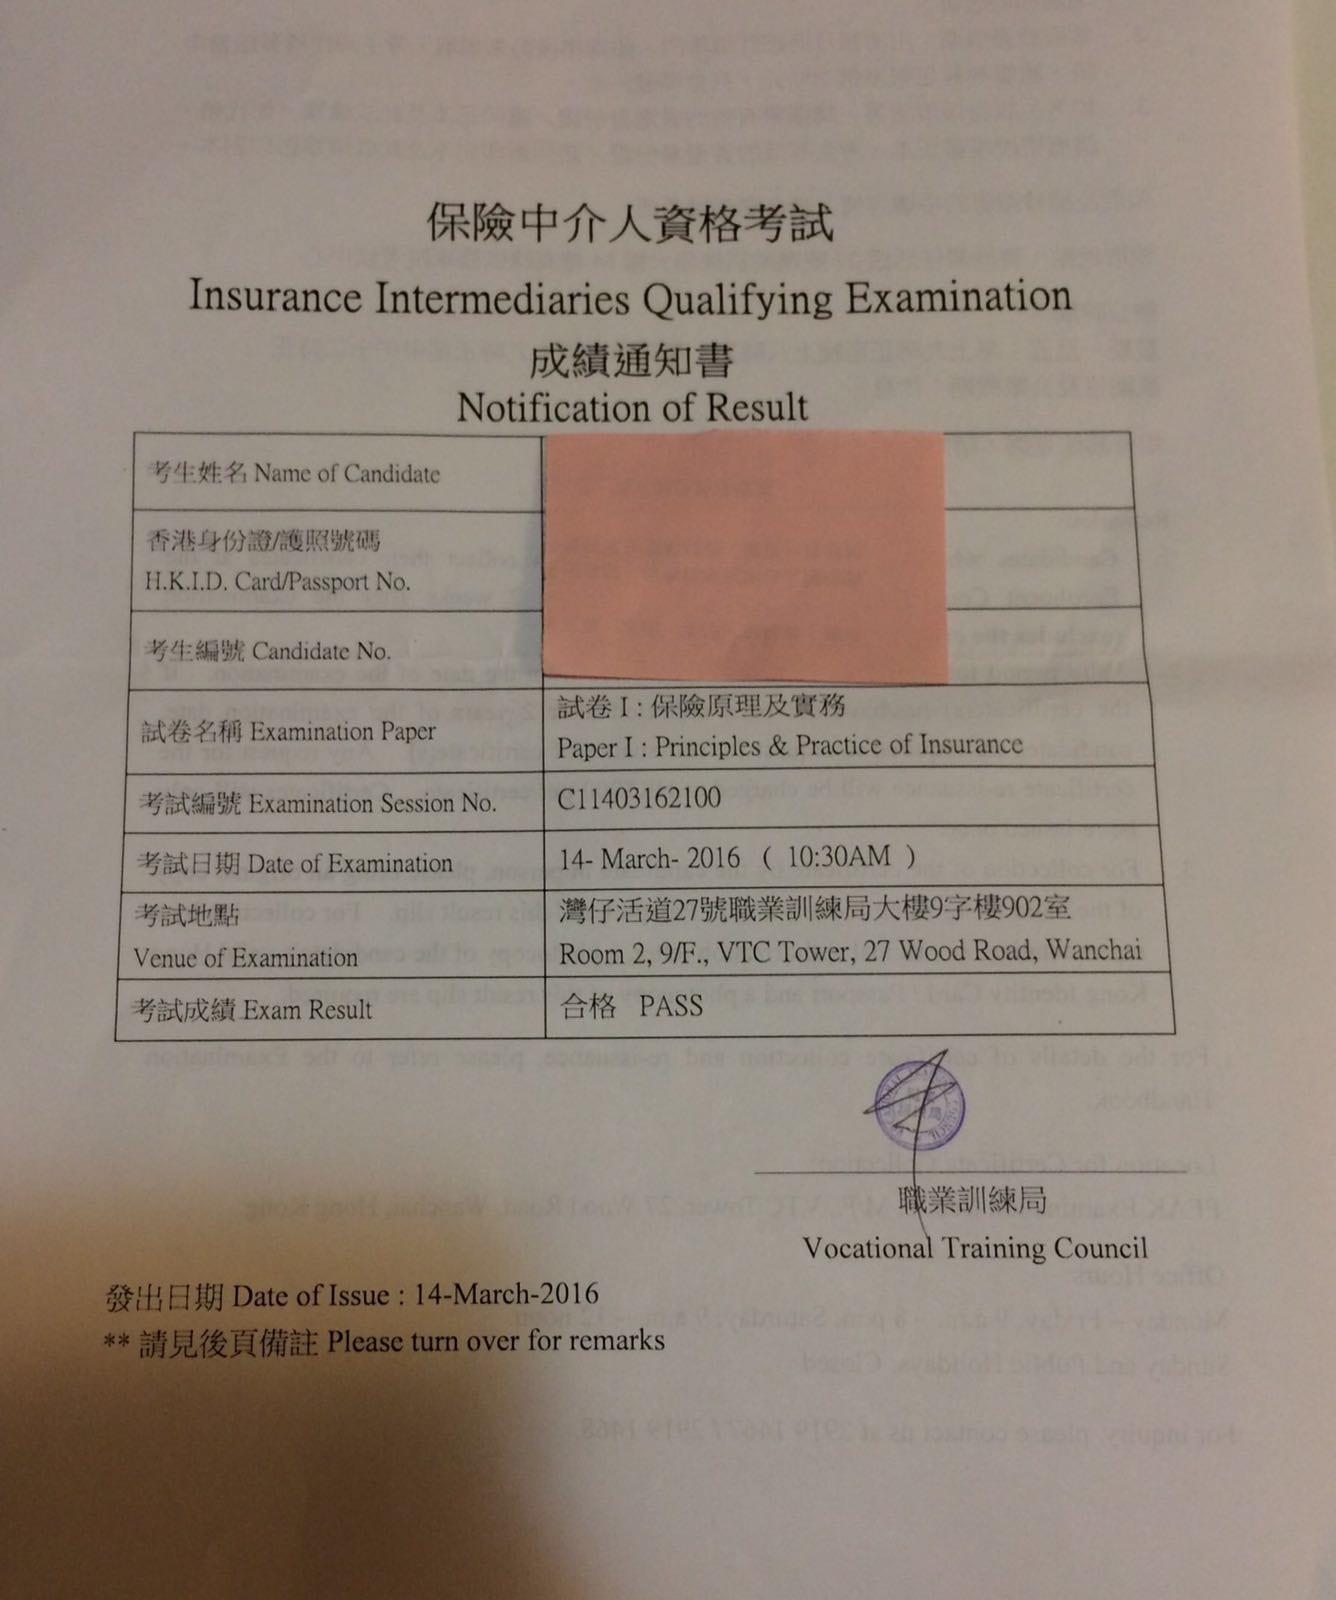 NT 14/3/2016 IIQE Paper 1 保險中介人資格考試卷一 Pass